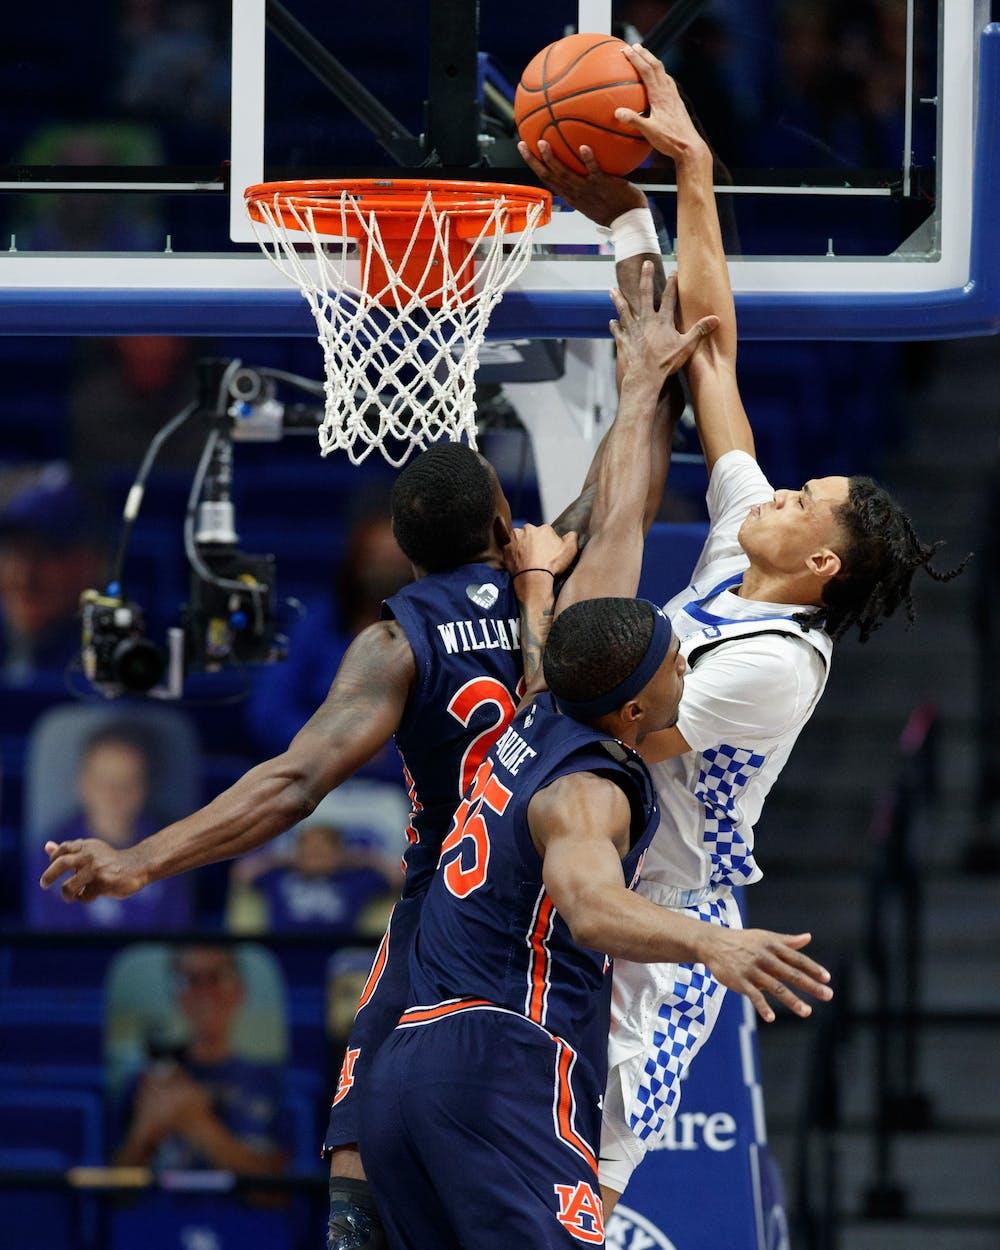 Kentucky's Brandon Boston Jr. is blocked by Auburn's Jaylin Williams in the second half as Kentucky defeated Auburn 82-80 on February 13, 2021.  Photo by Elliott Hess | UK Athletics